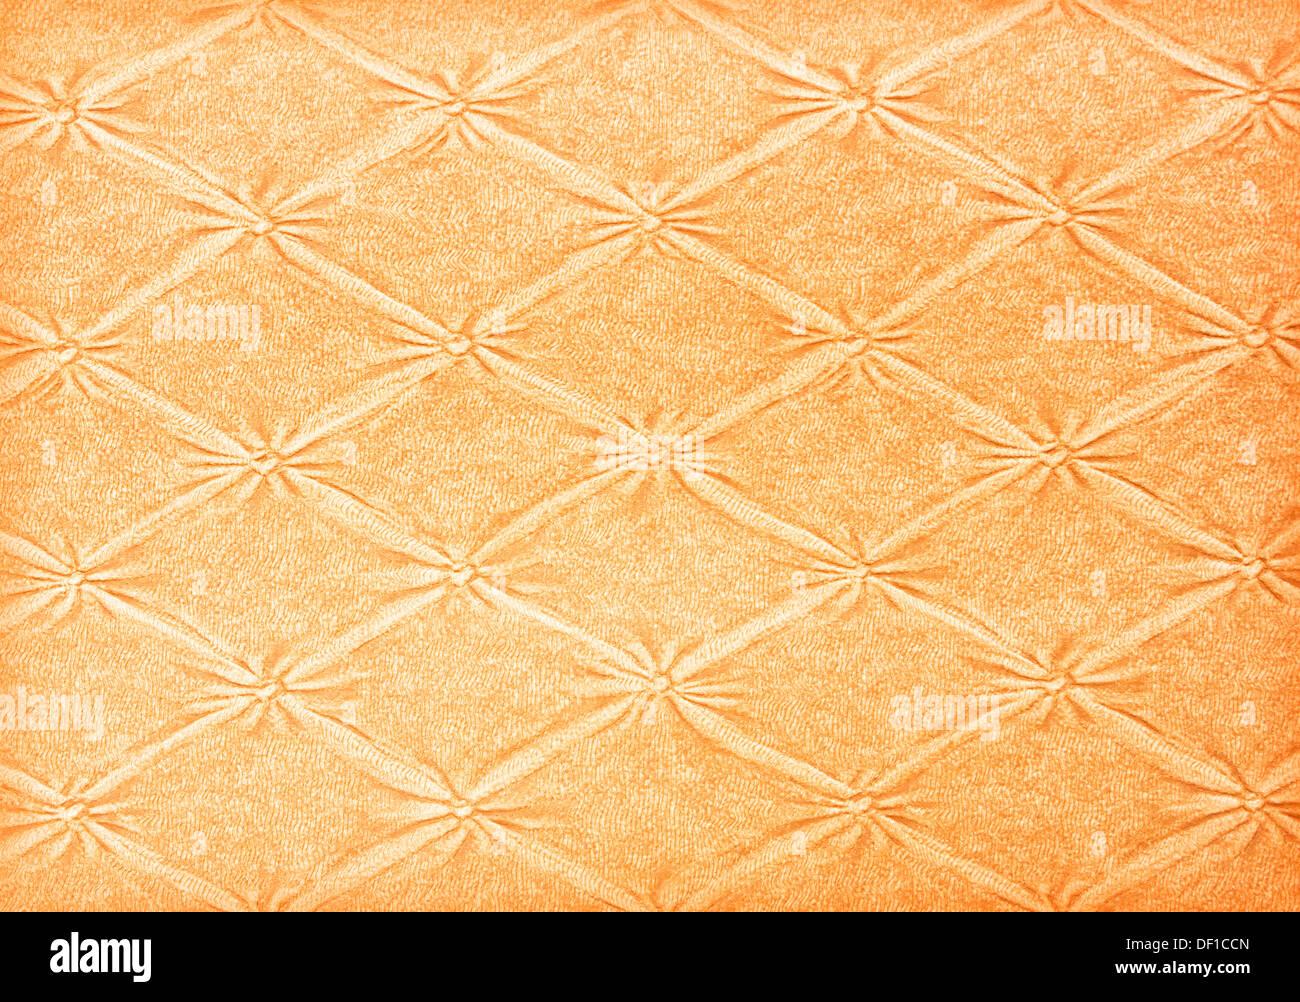 Grunge Wallpaper Stock Photos & Grunge Wallpaper Stock Images - Alamy